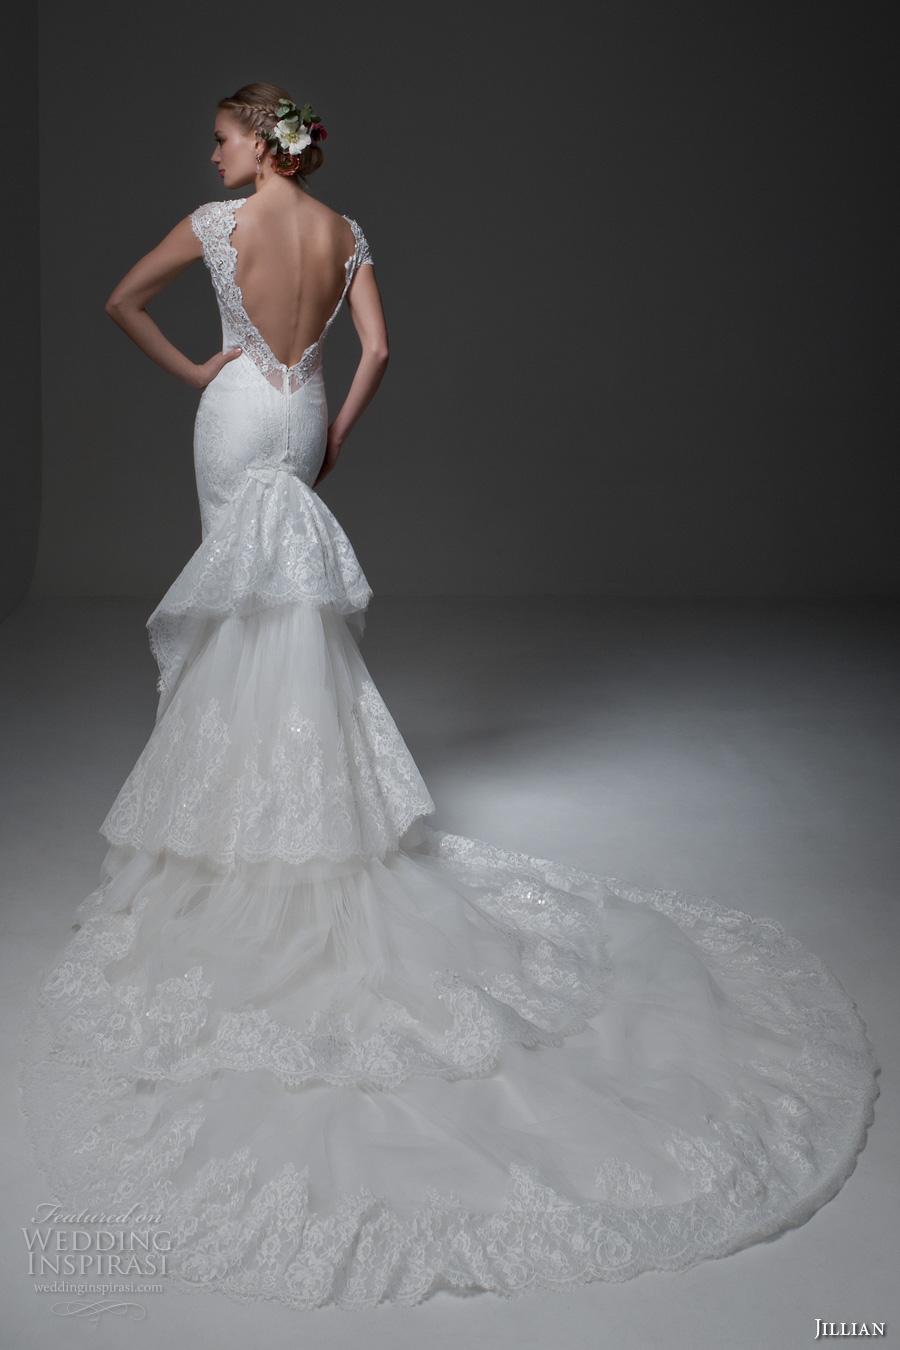 jillian 2017 bridal cap sleeves sweetheart neckline full embellishment elegant sheath wedding dress low back tiered long train (miranda) bv